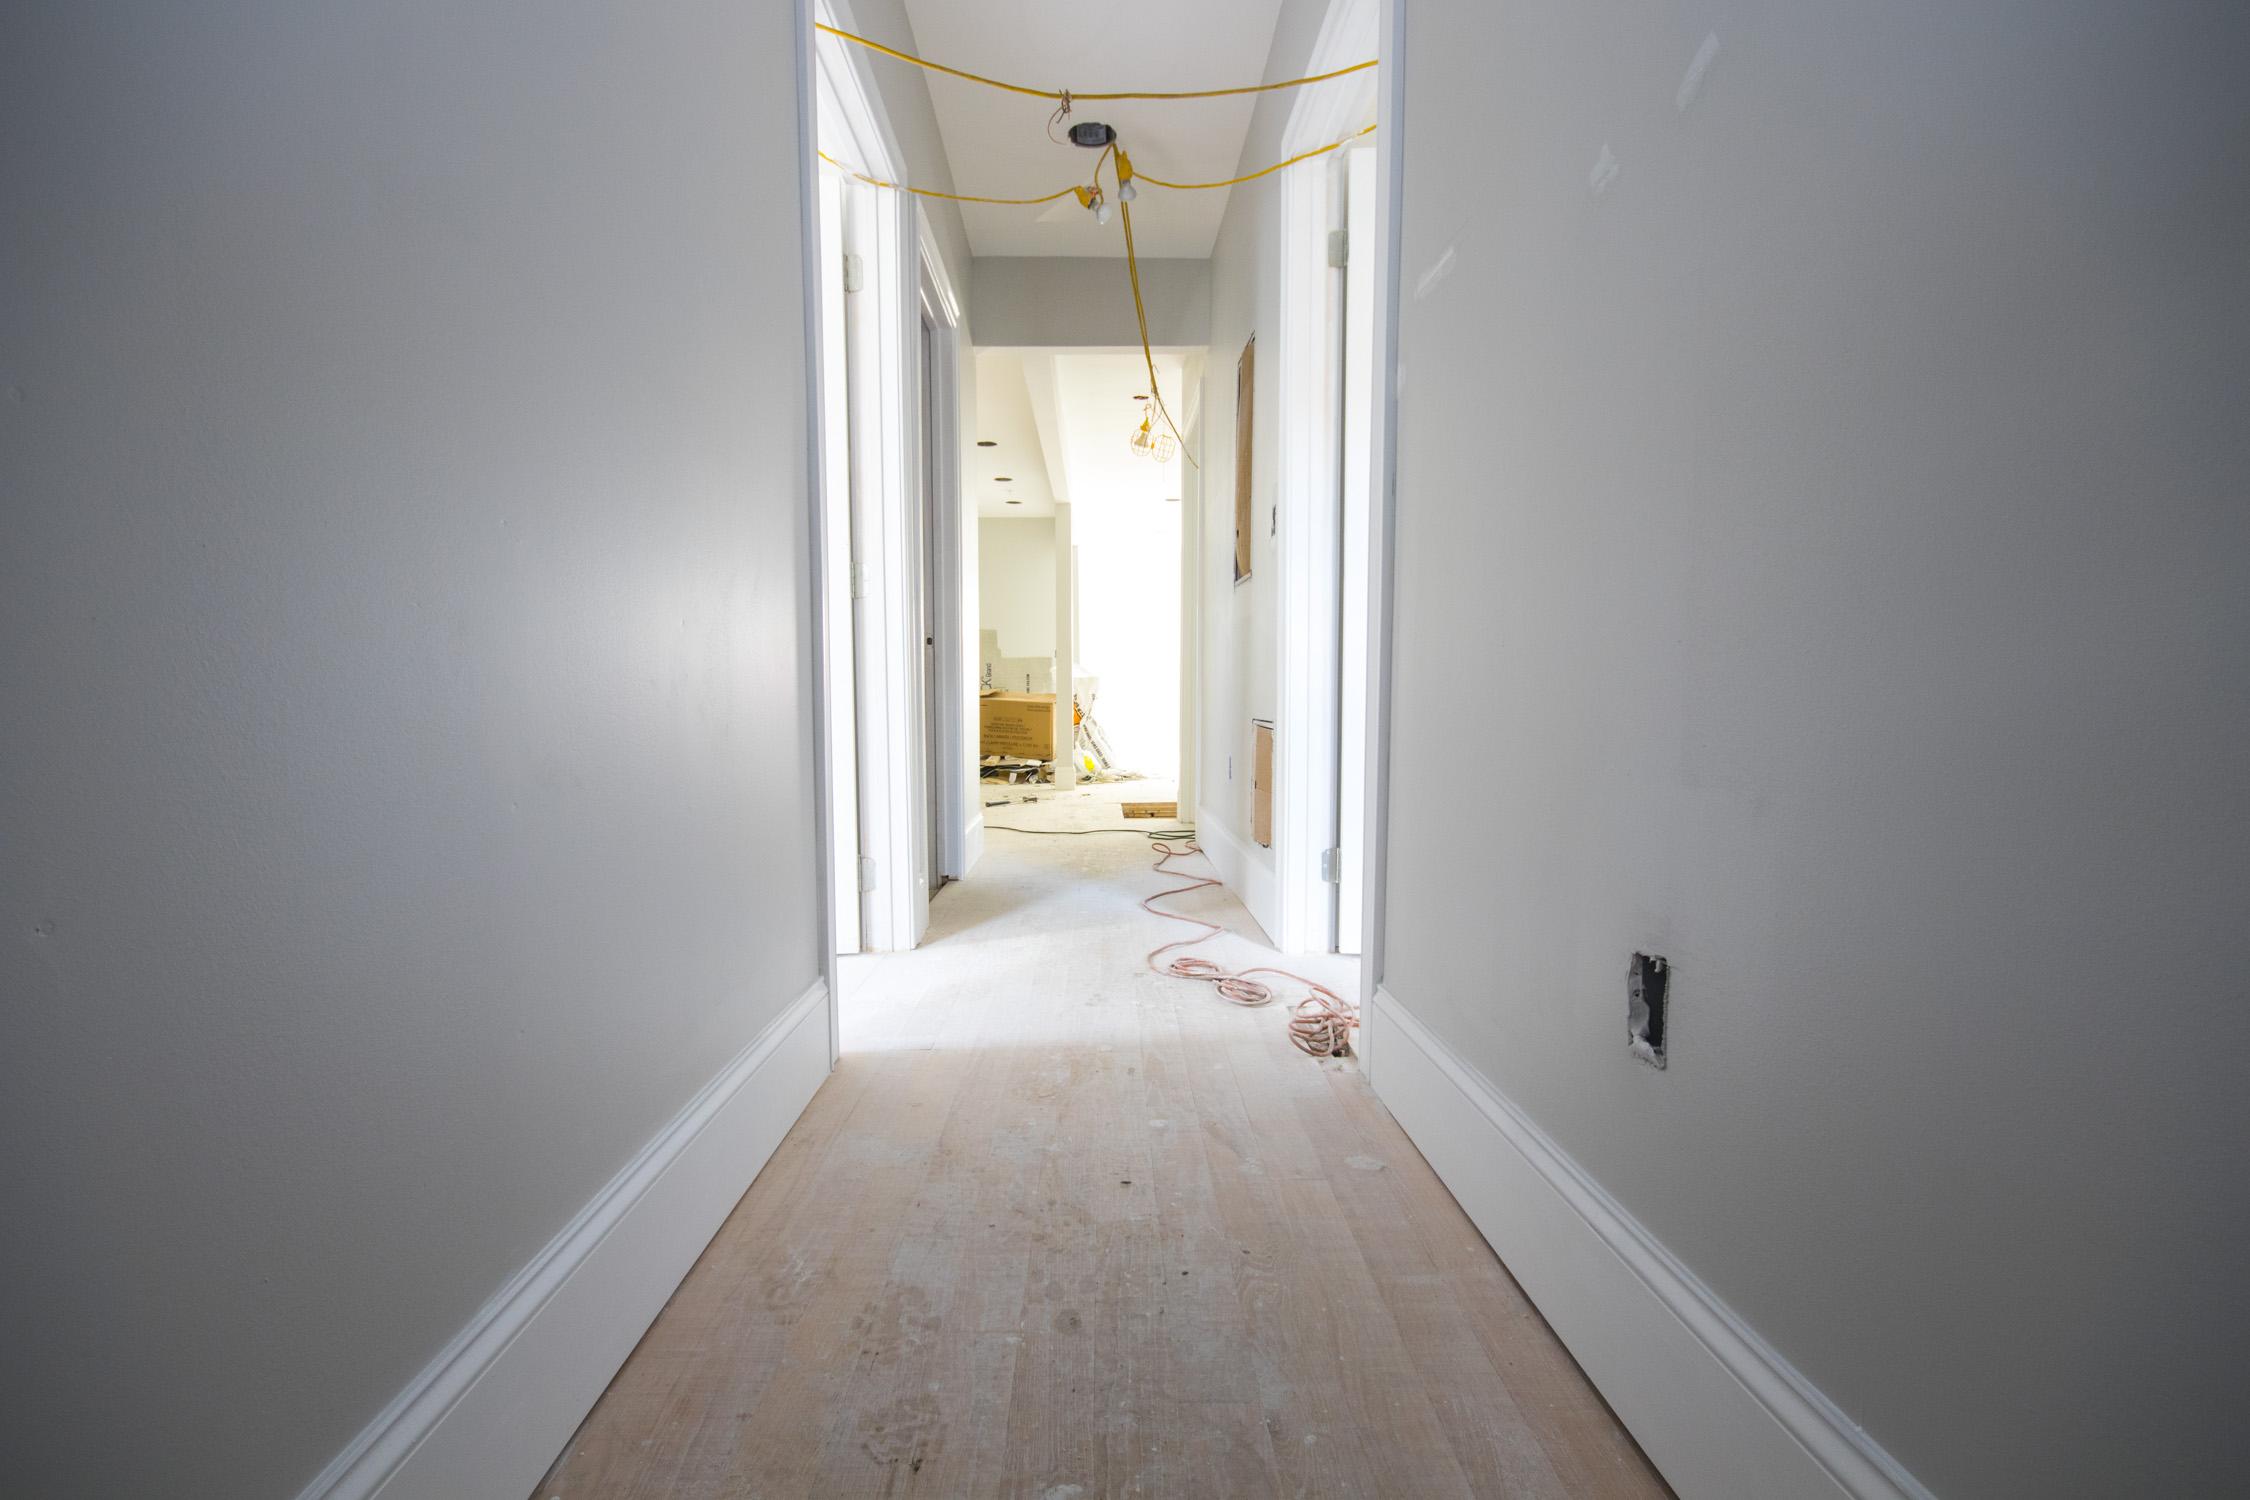 P. Northeast Contractors 27 Darling Street Boston Condo Renovation_77